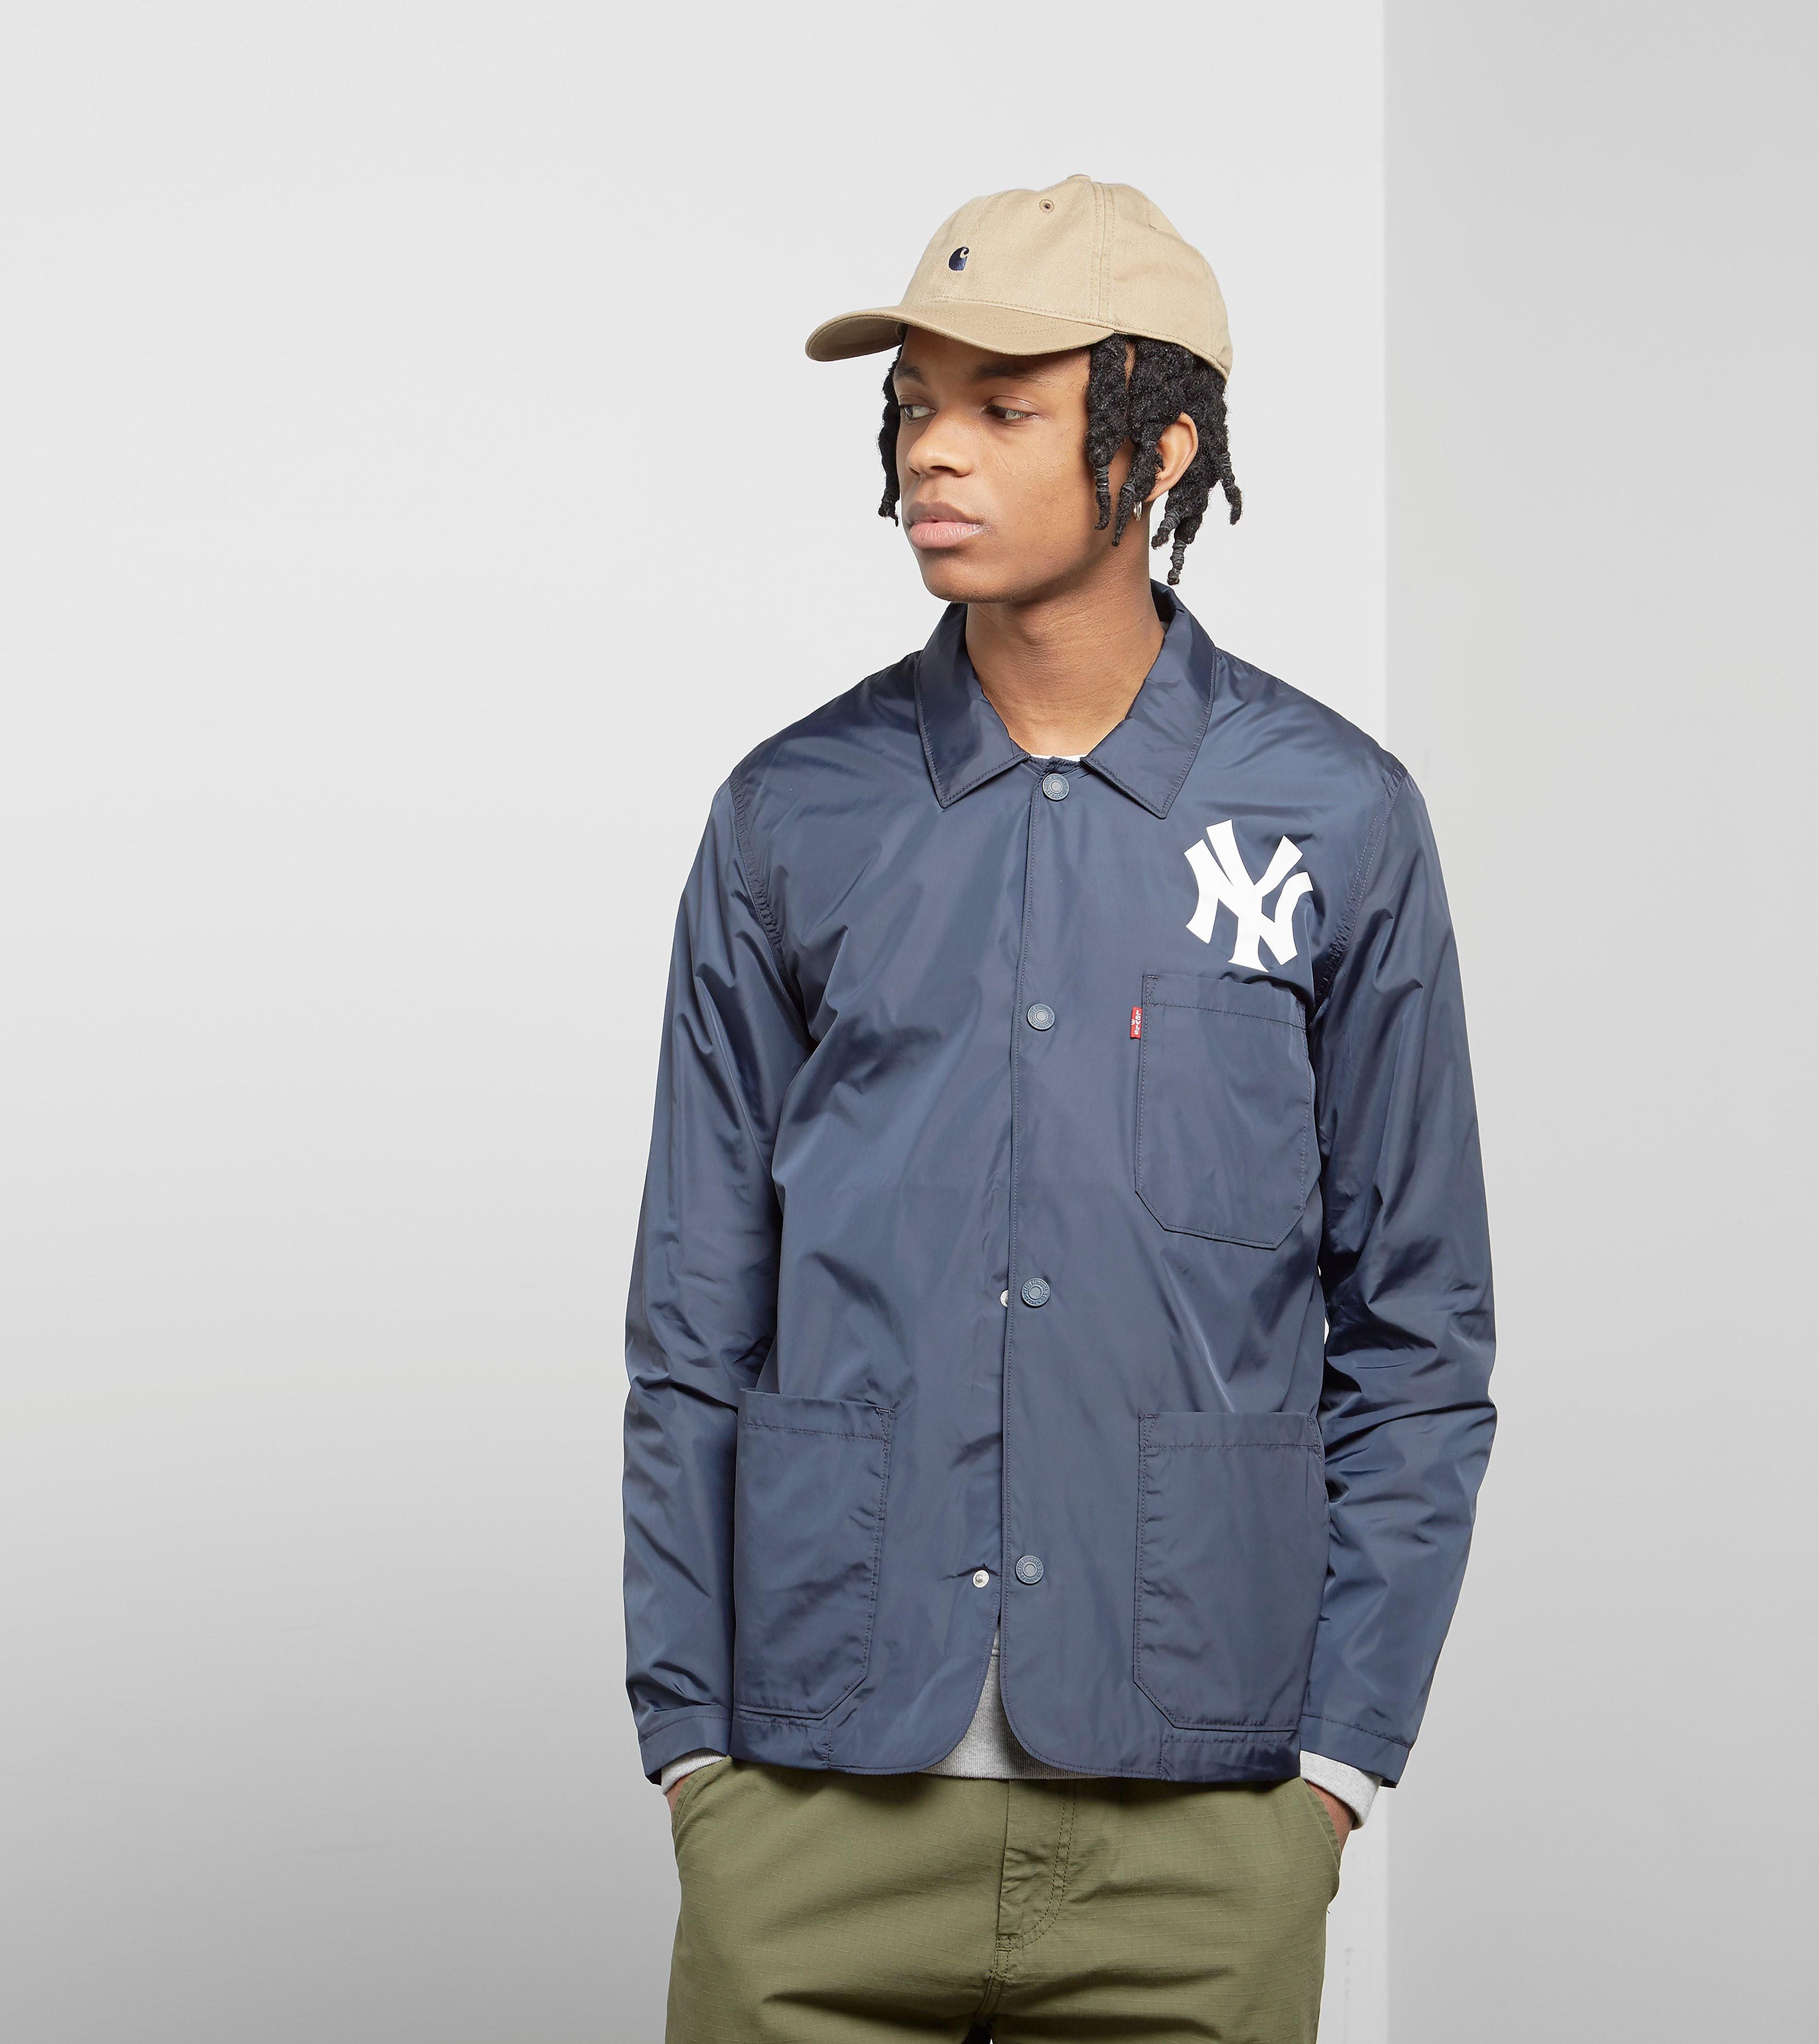 Levis x MLB New York Yankees Club Coat